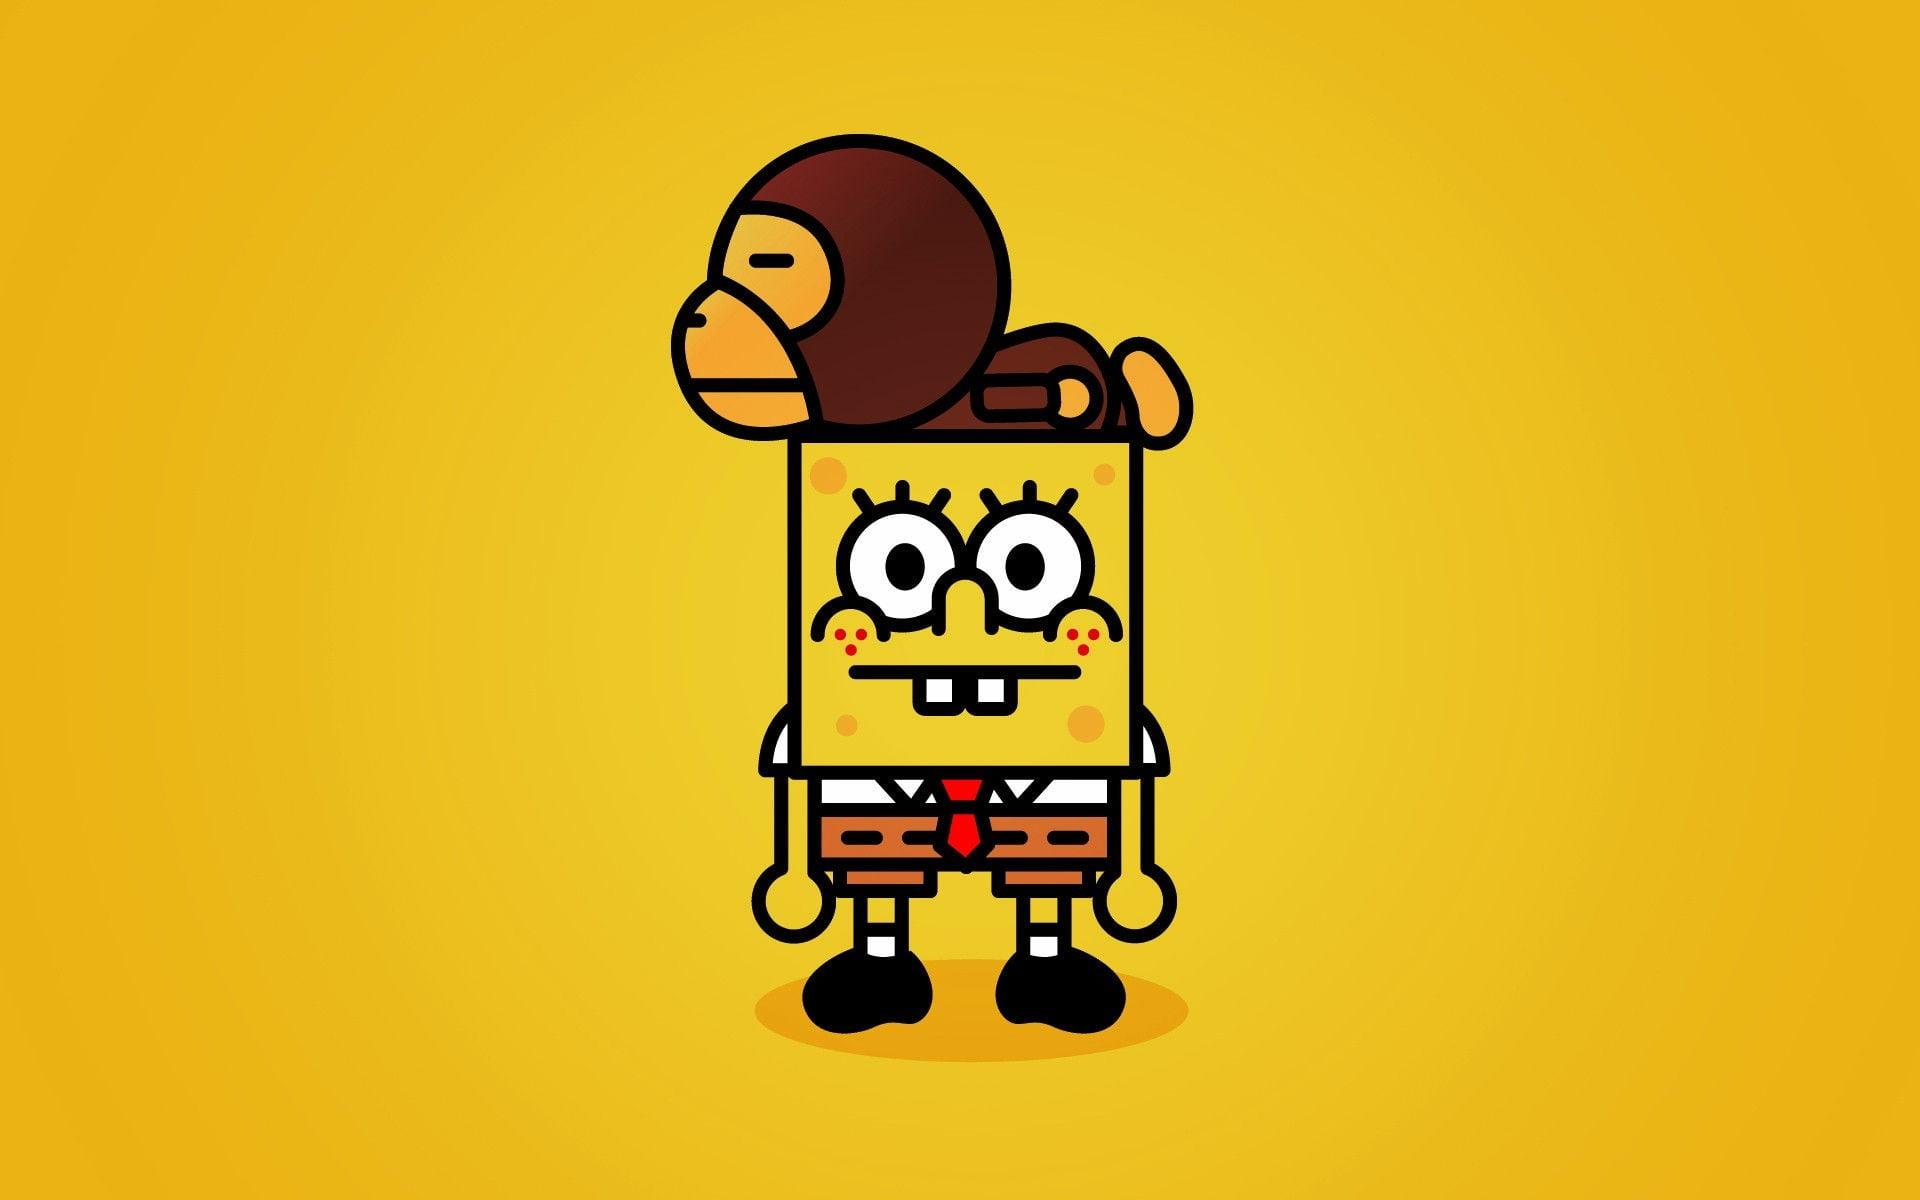 spongebob wallpaper spongebob squarepants